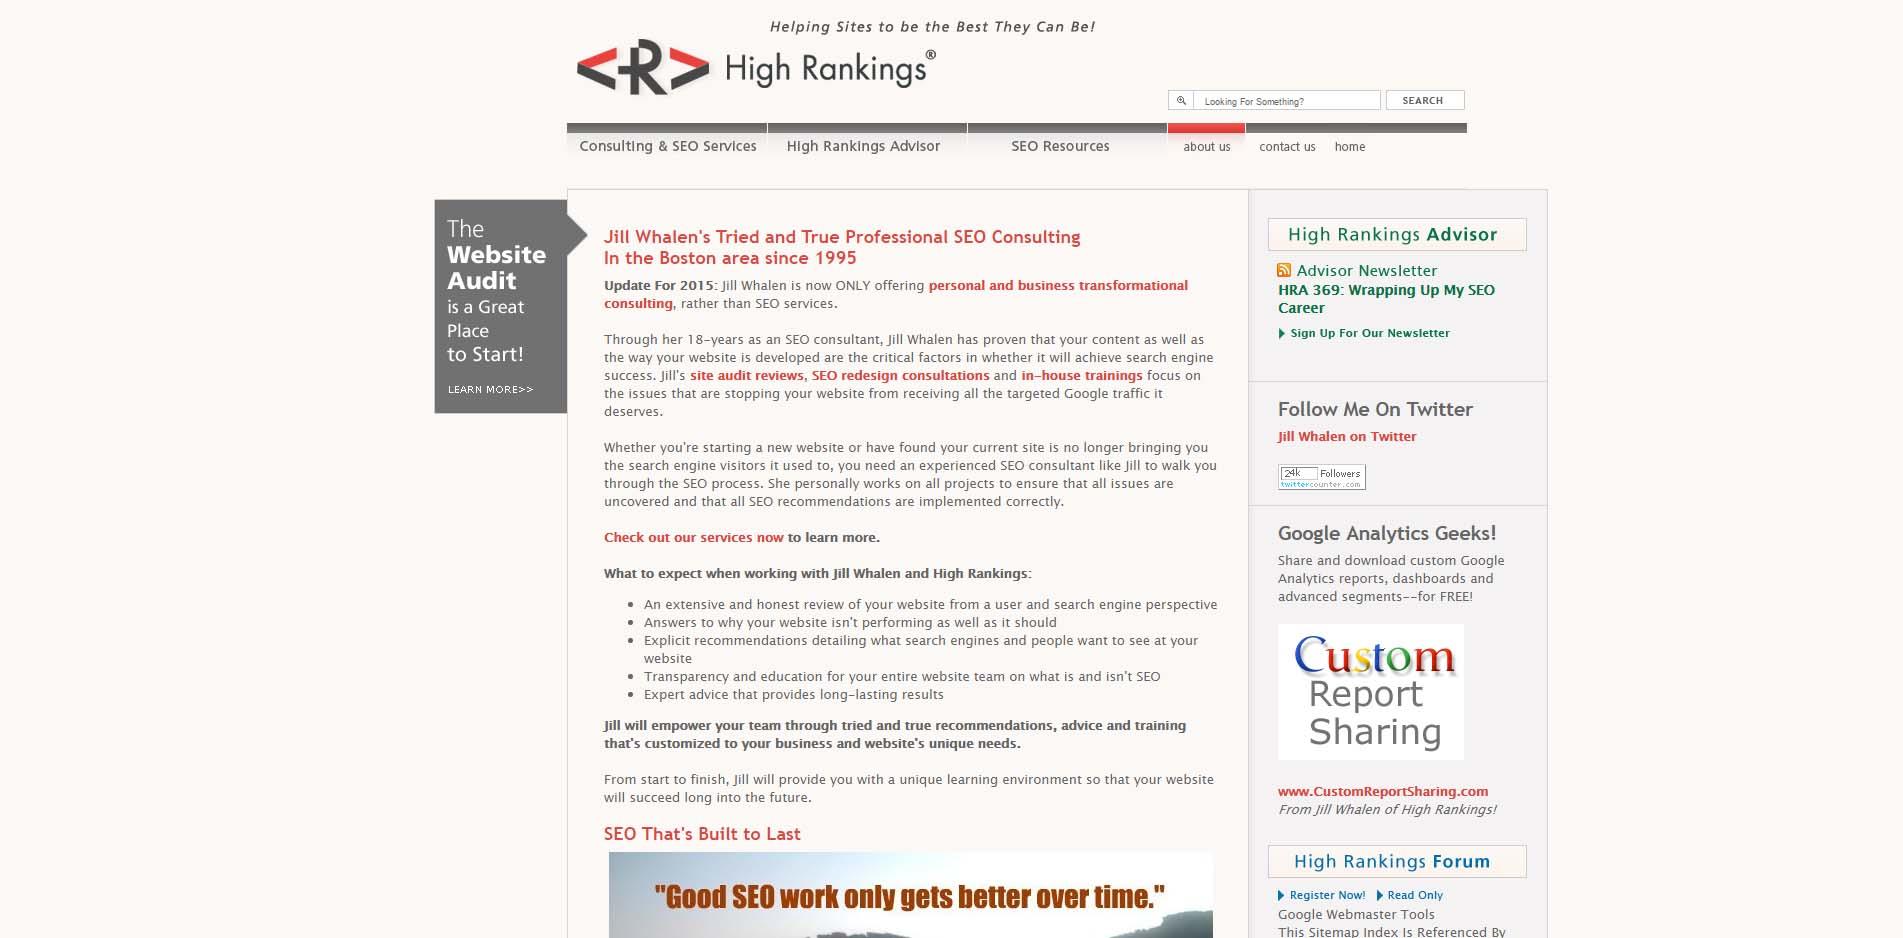 seo-blog-highrankings-com